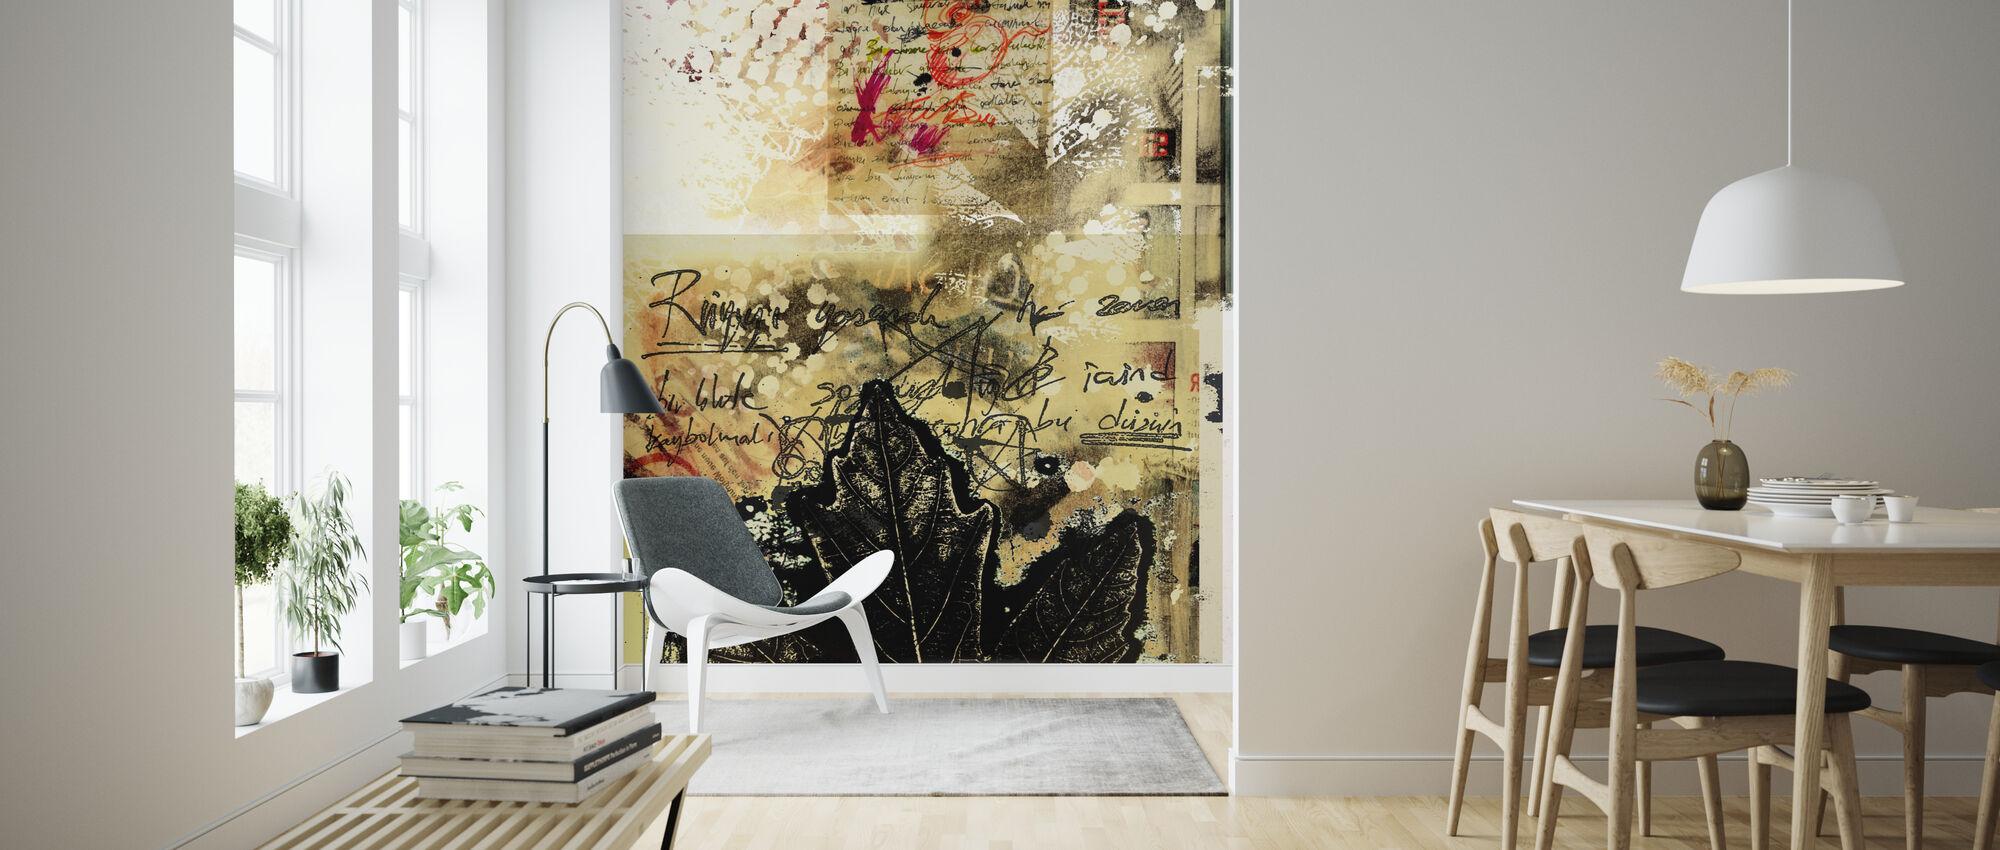 Abstracte Grunge achtergrond - Behang - Woonkamer